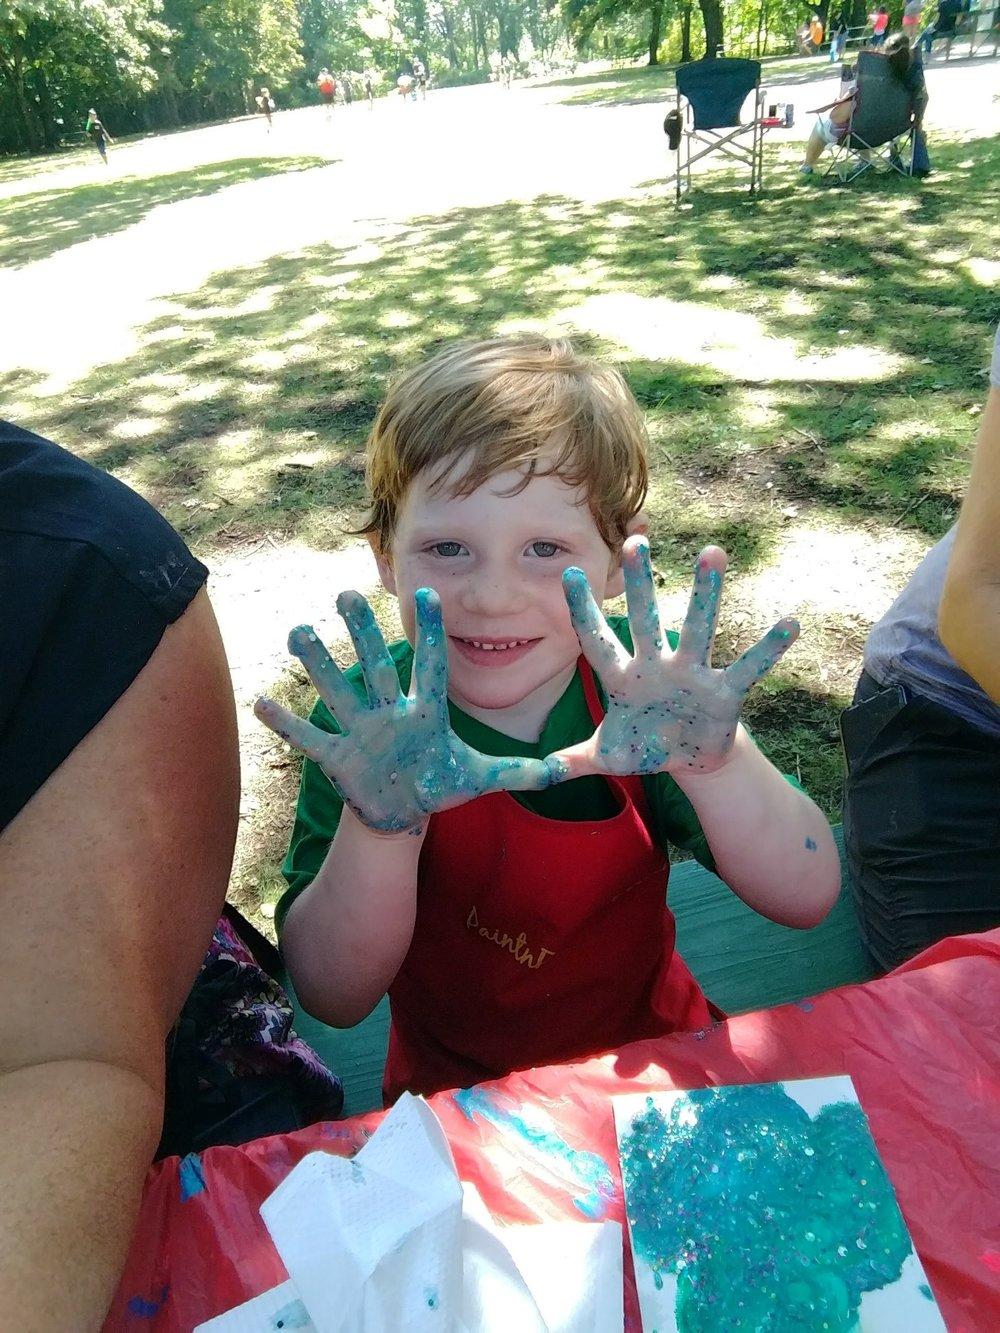 4X4 GLITTERFLIES FINGERPAINTS BOY GLITTER HANDS.jpg